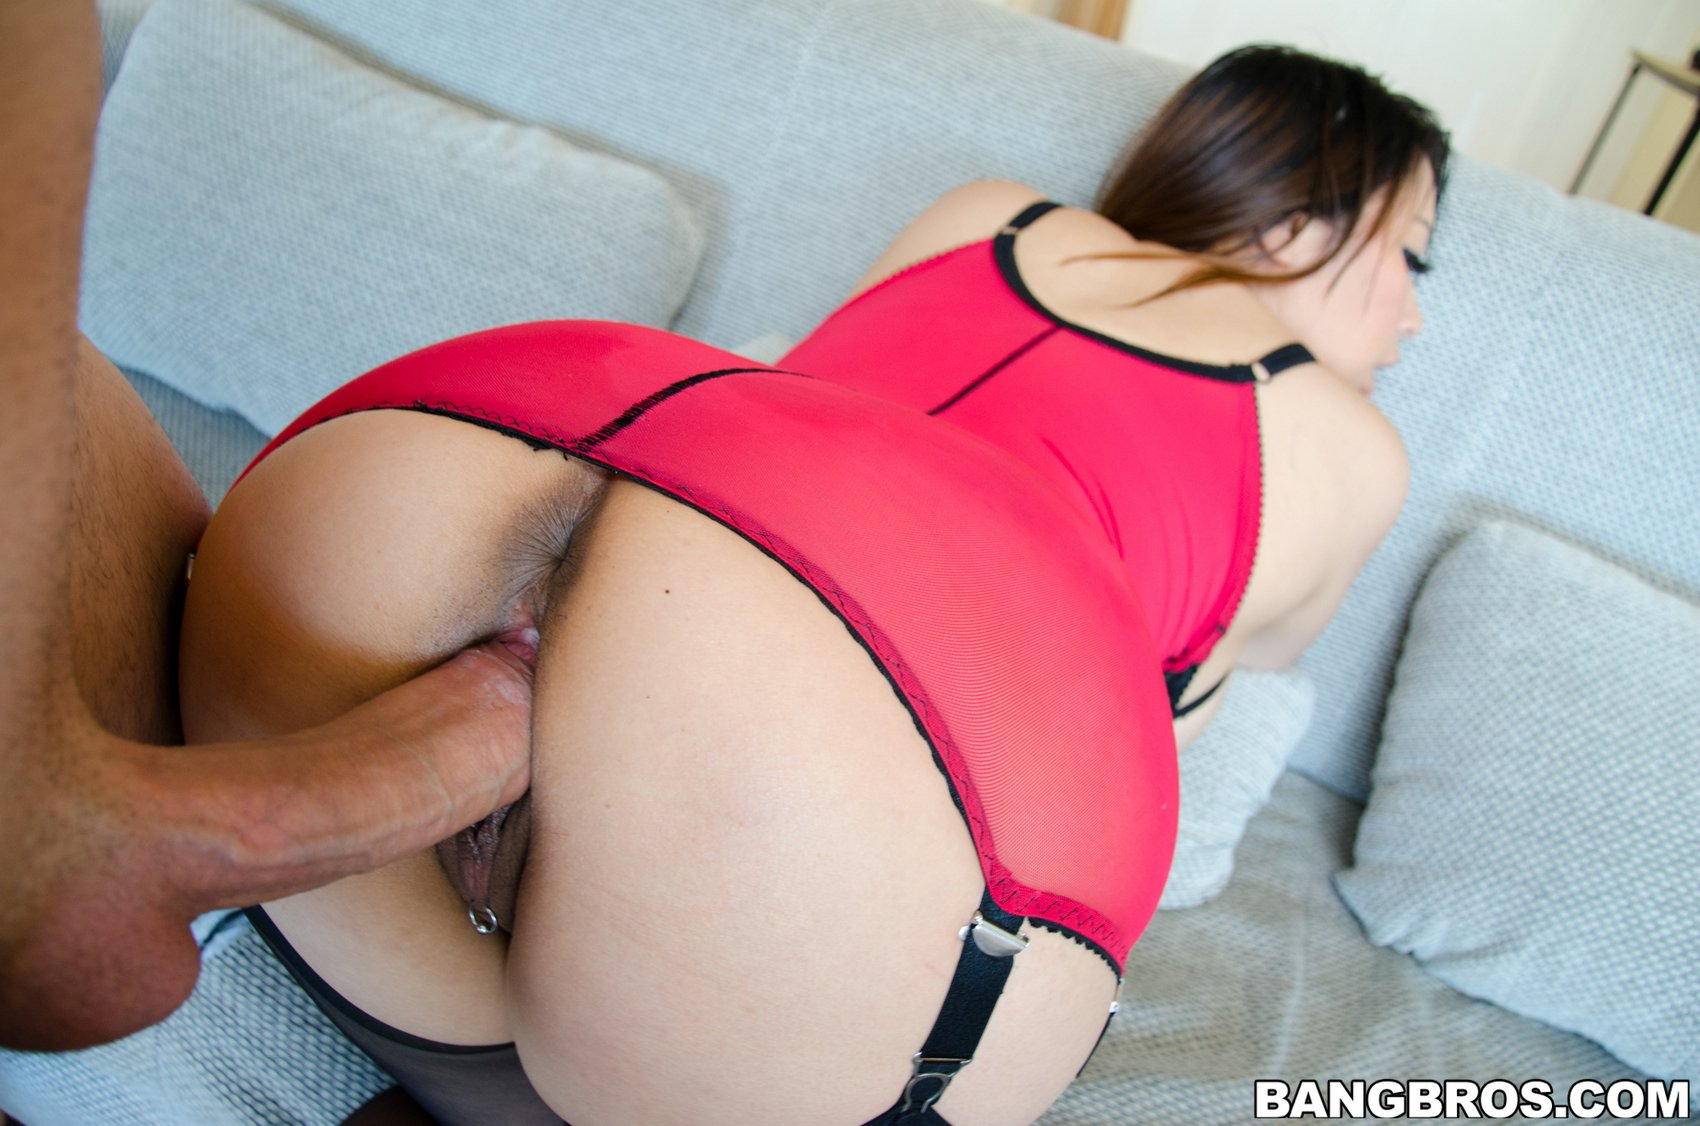 Sexy latina gets fucked by bbc 10